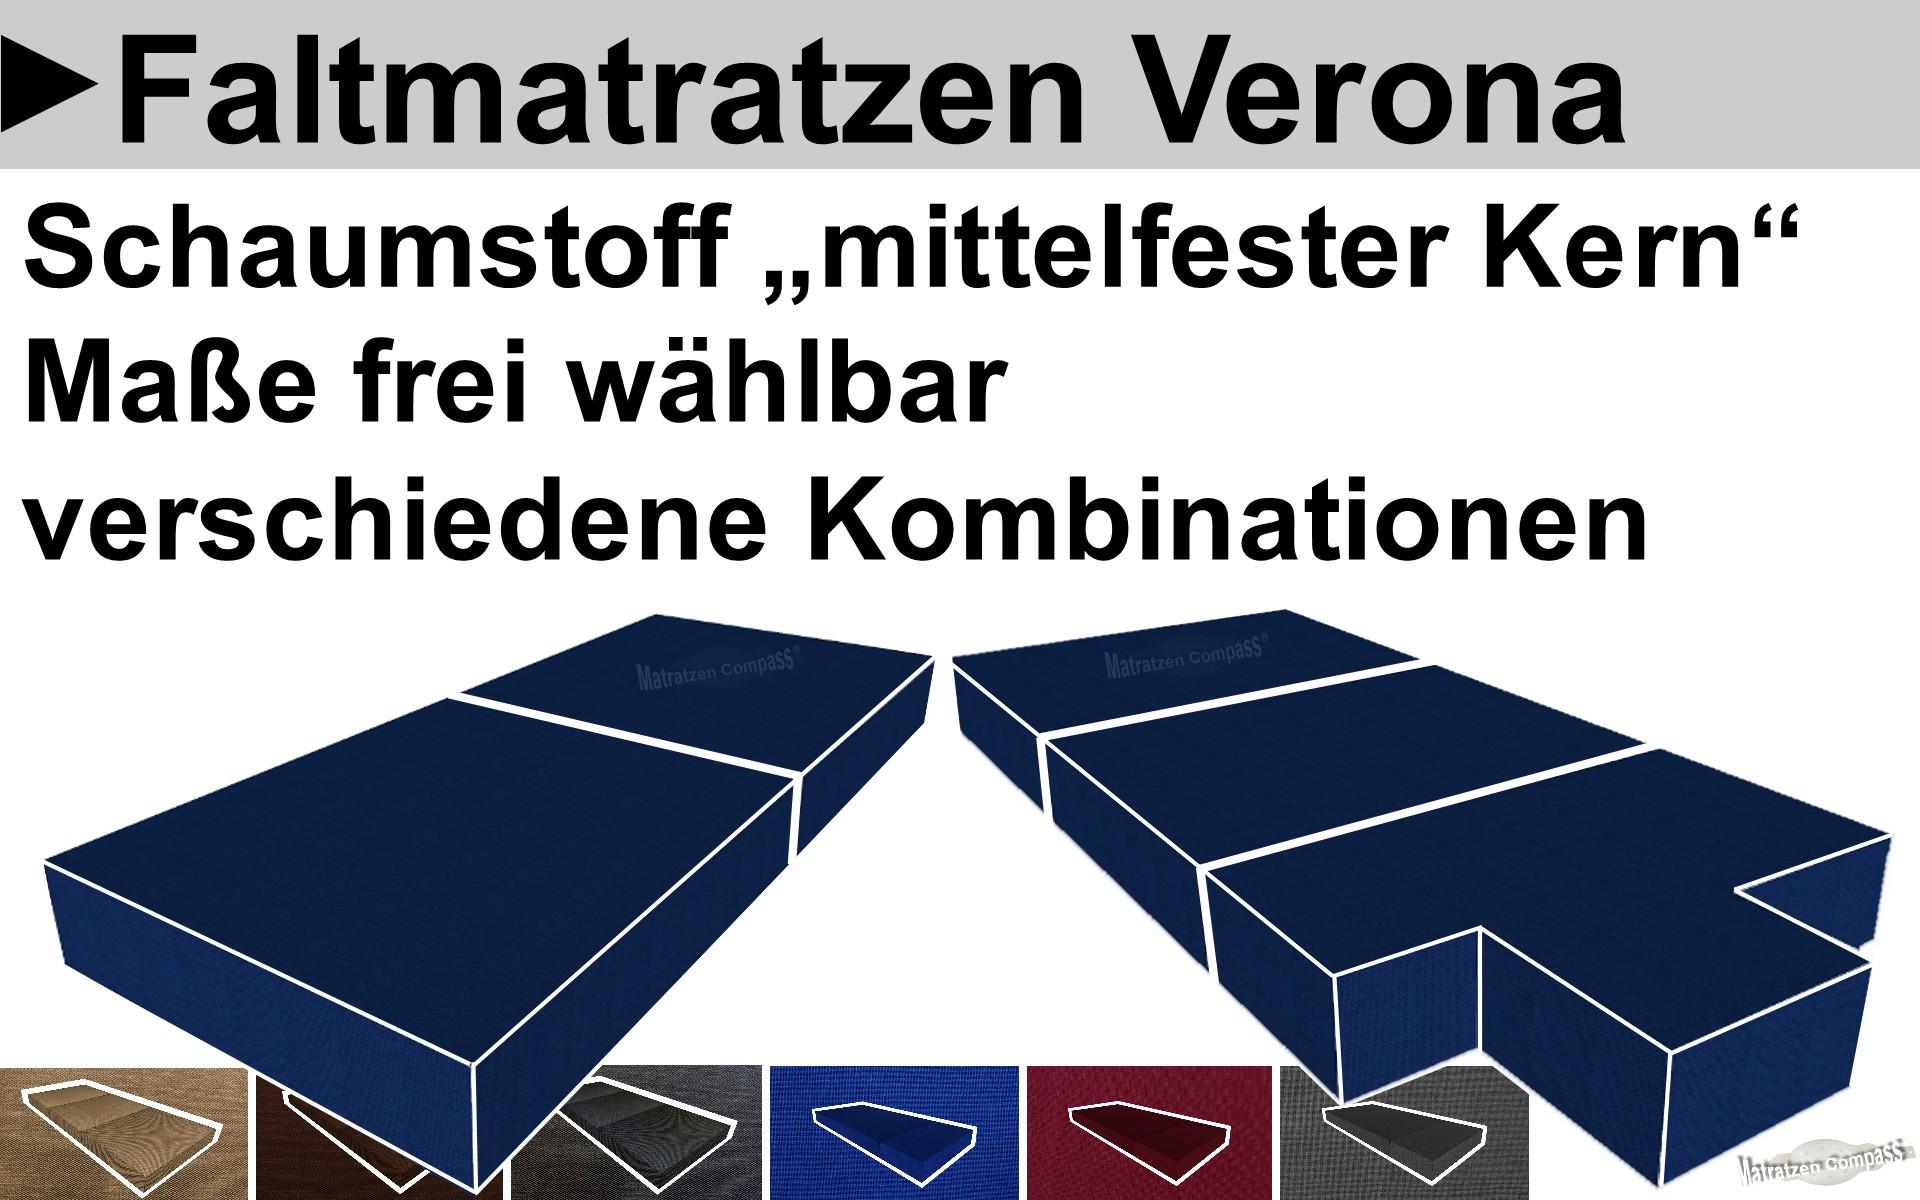 Faltmatratze-nach-Mass-Verona-Faltmatratze-Wunschmass-Verona-Klappmatratze-Anfertigung-Verona-Faltmatratze-konfigurieren-Klappmatratze-nach-Mass-VeronaA4hvXEs5Z5QXC